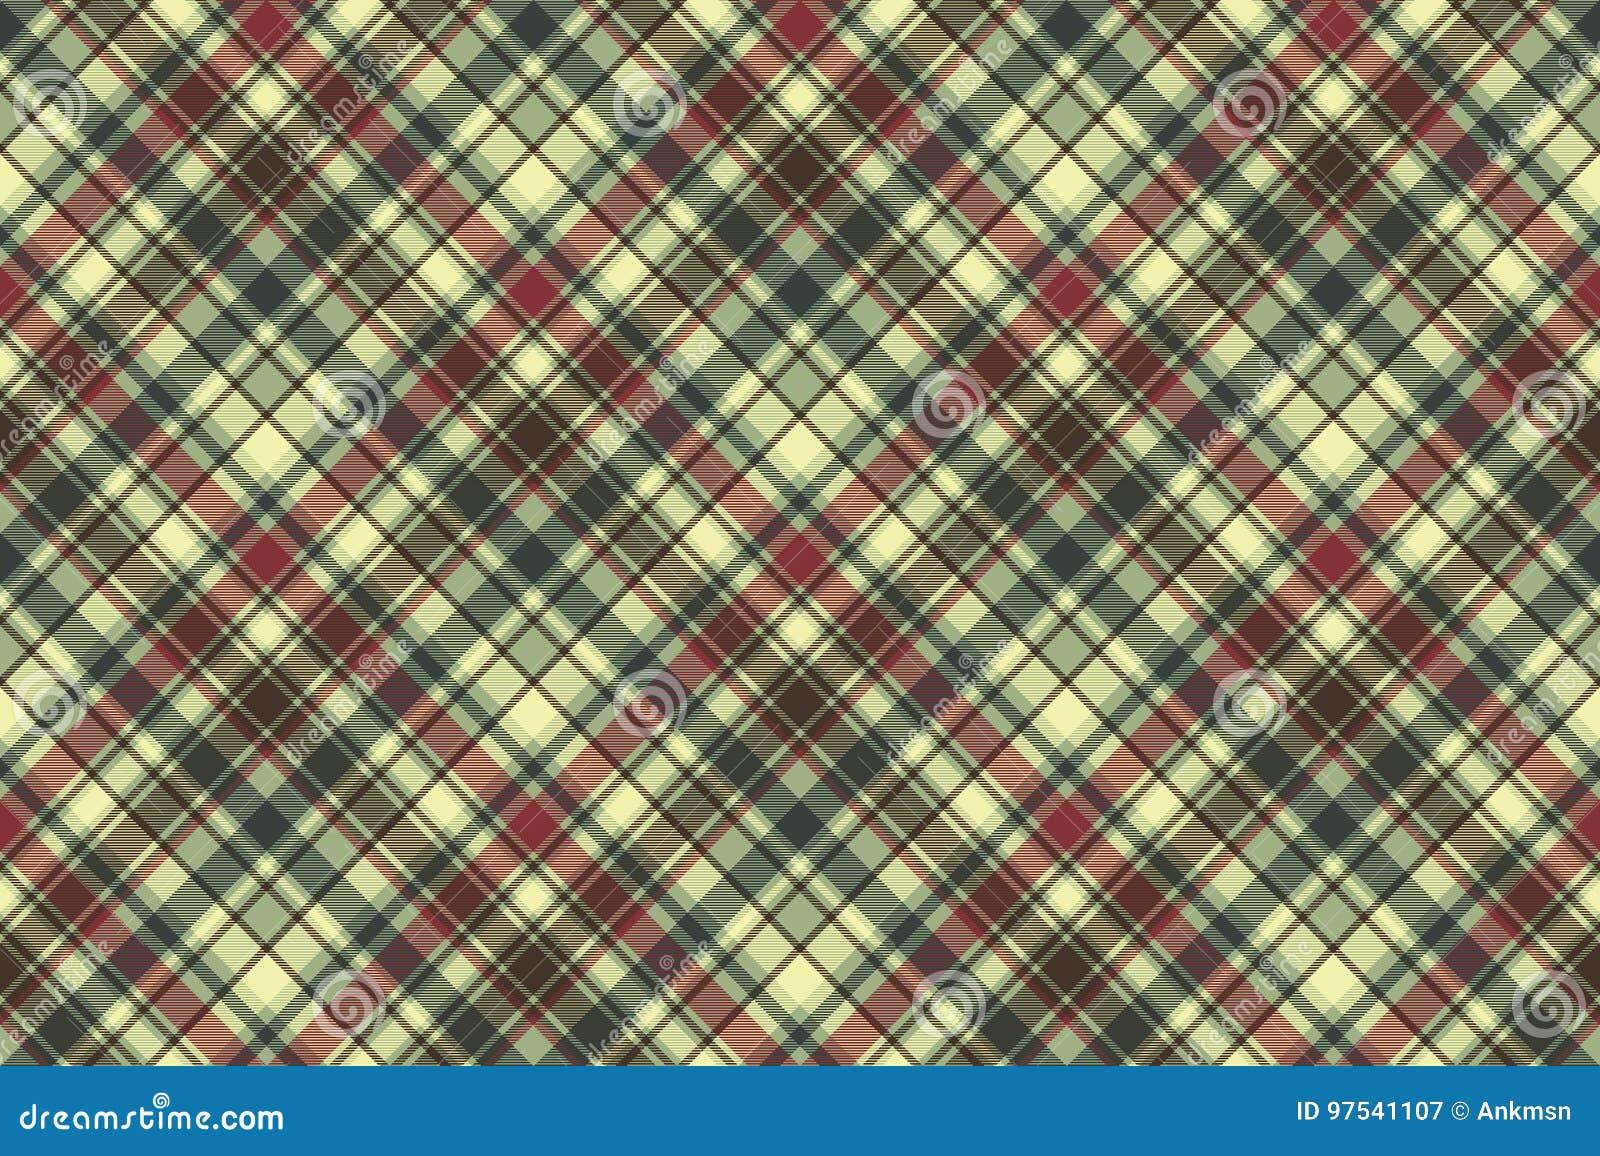 Struttura senza cuciture diagonale del tessuto del plaid verde